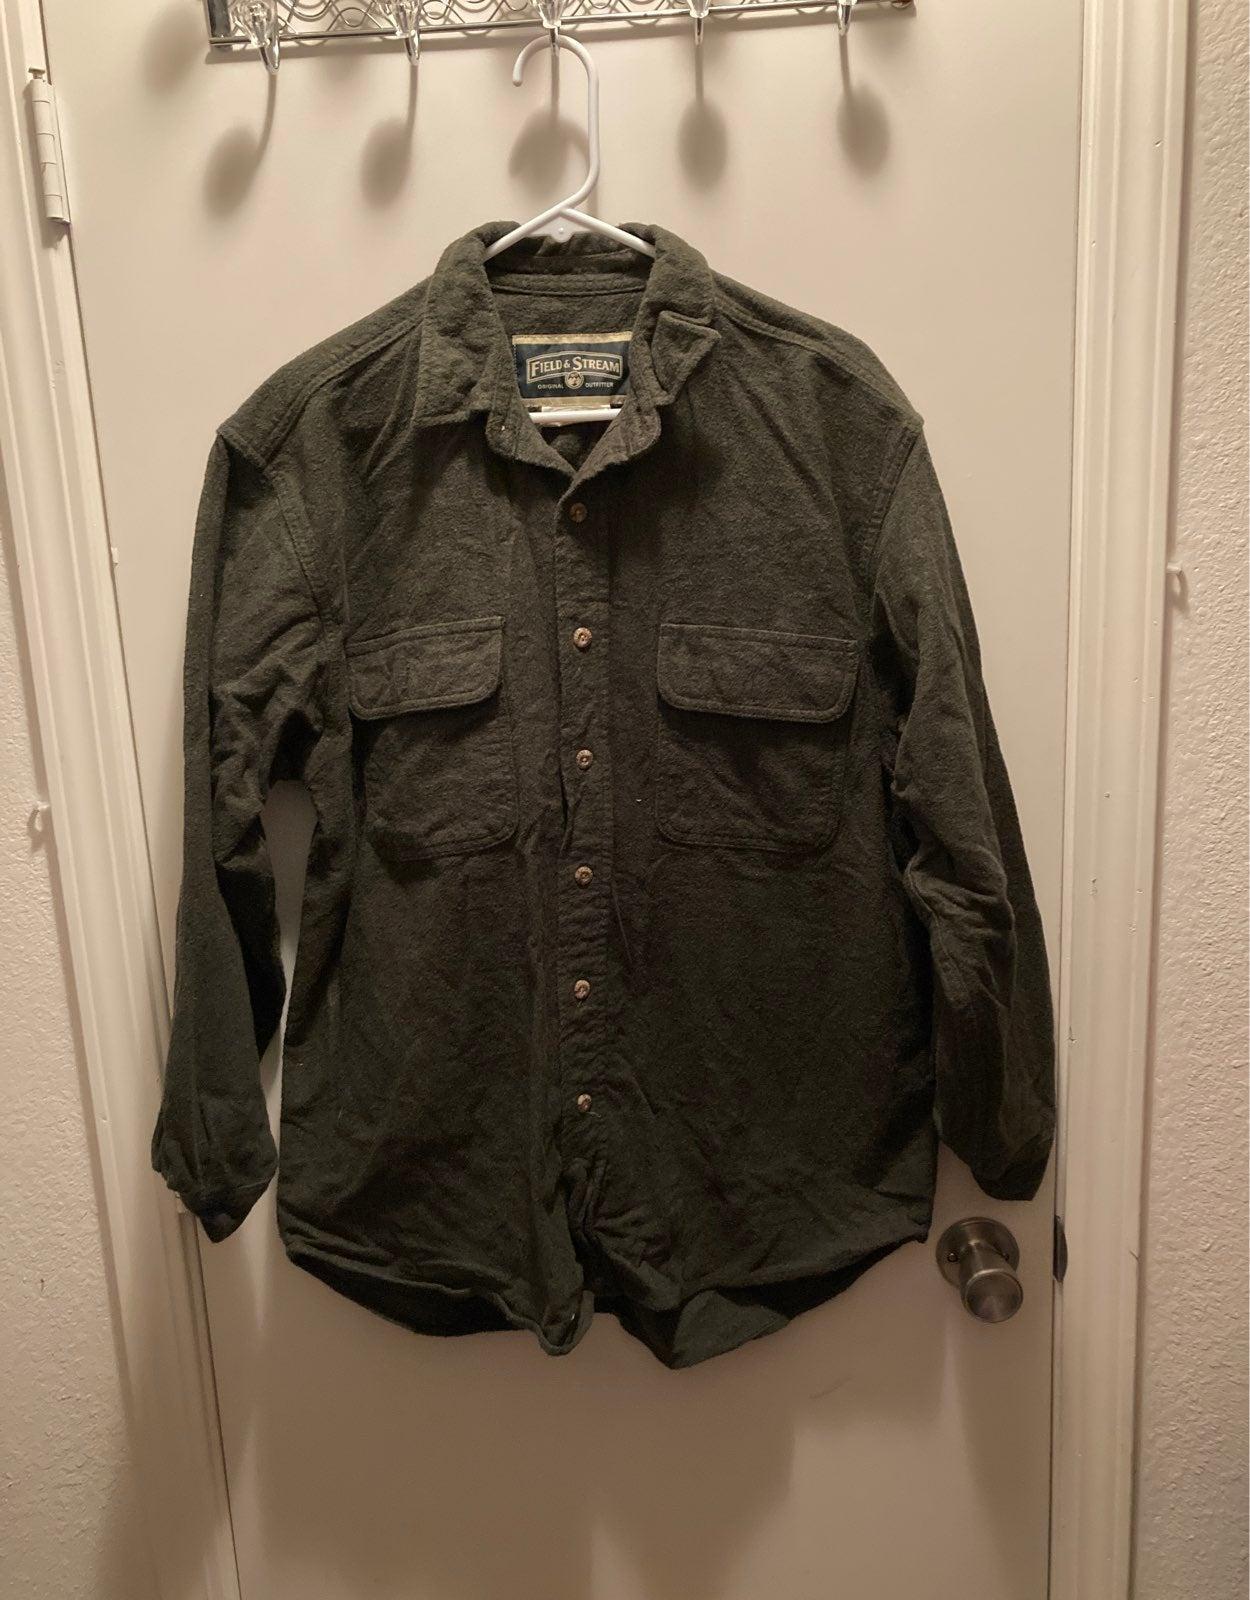 Green Fleece coat jacket large